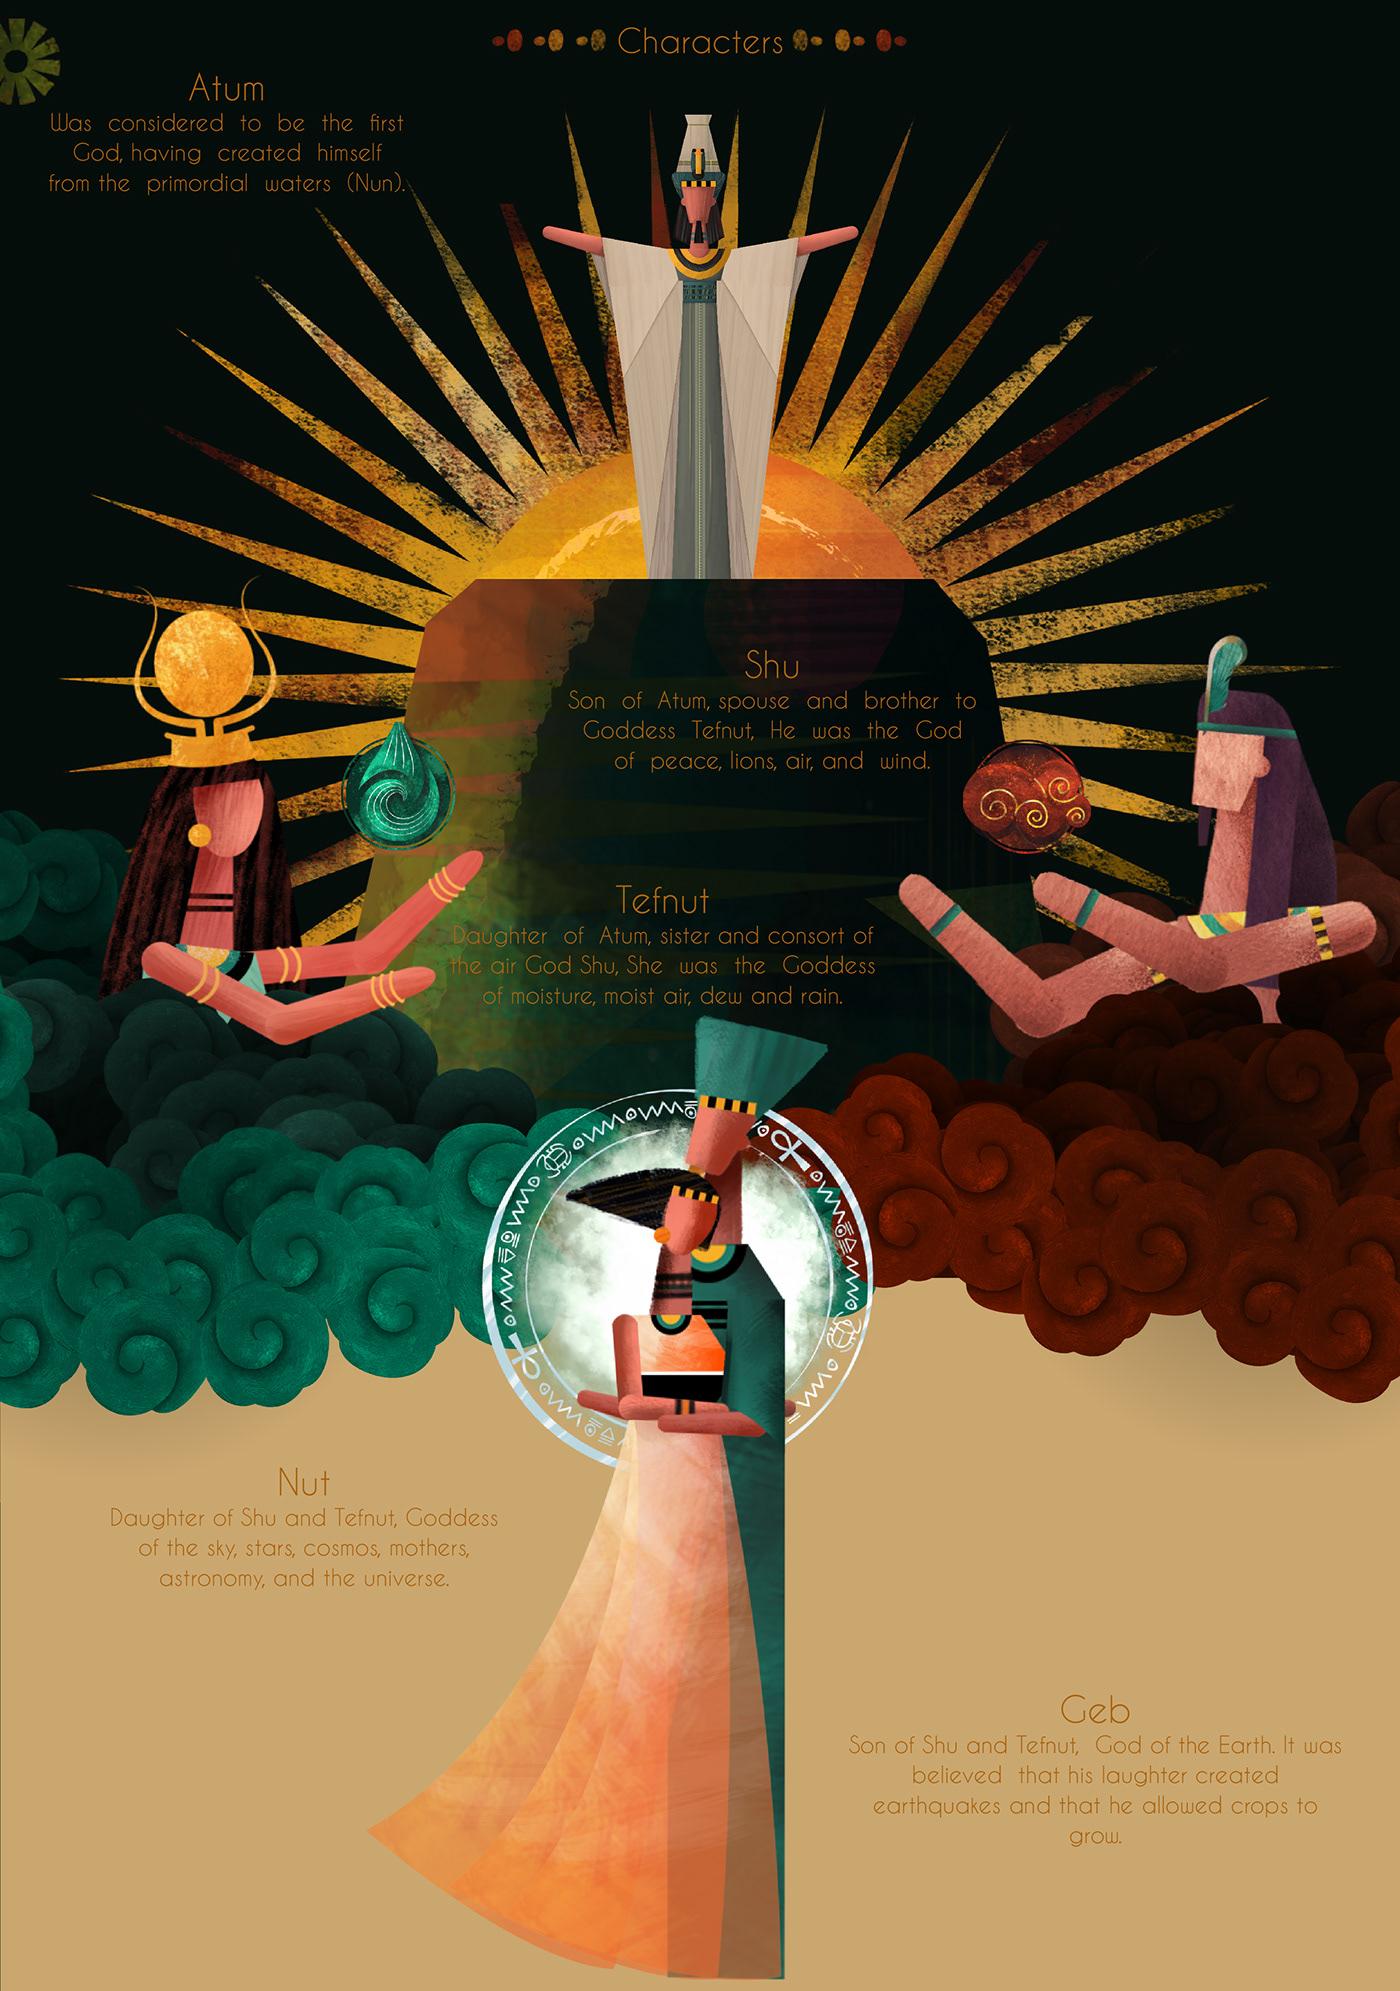 ancient egypt animation  cutout egypt gods history Illustation motion graphics  Pharaohs short movie